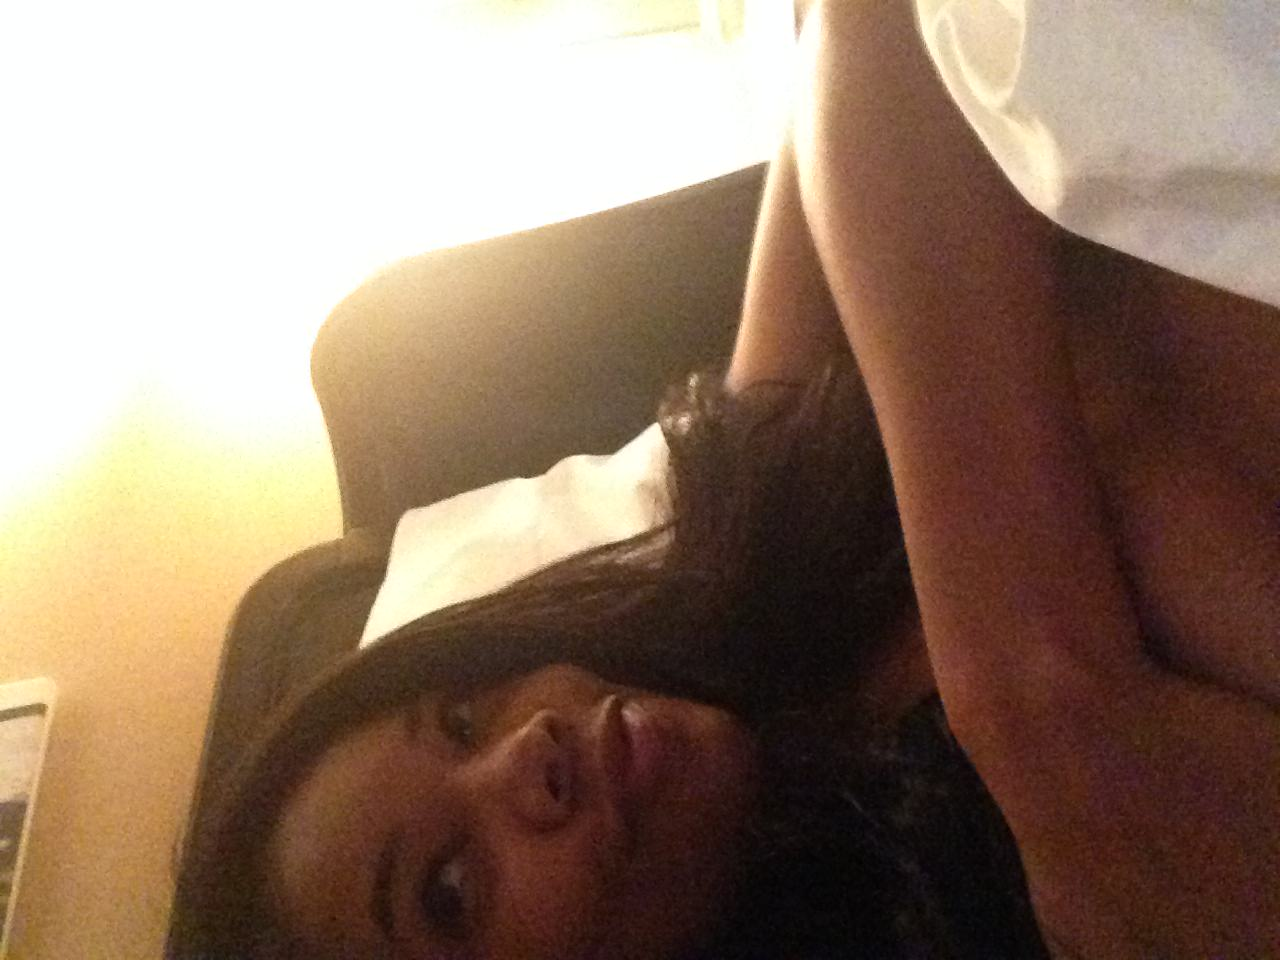 Gabrielle Union IMG 4148